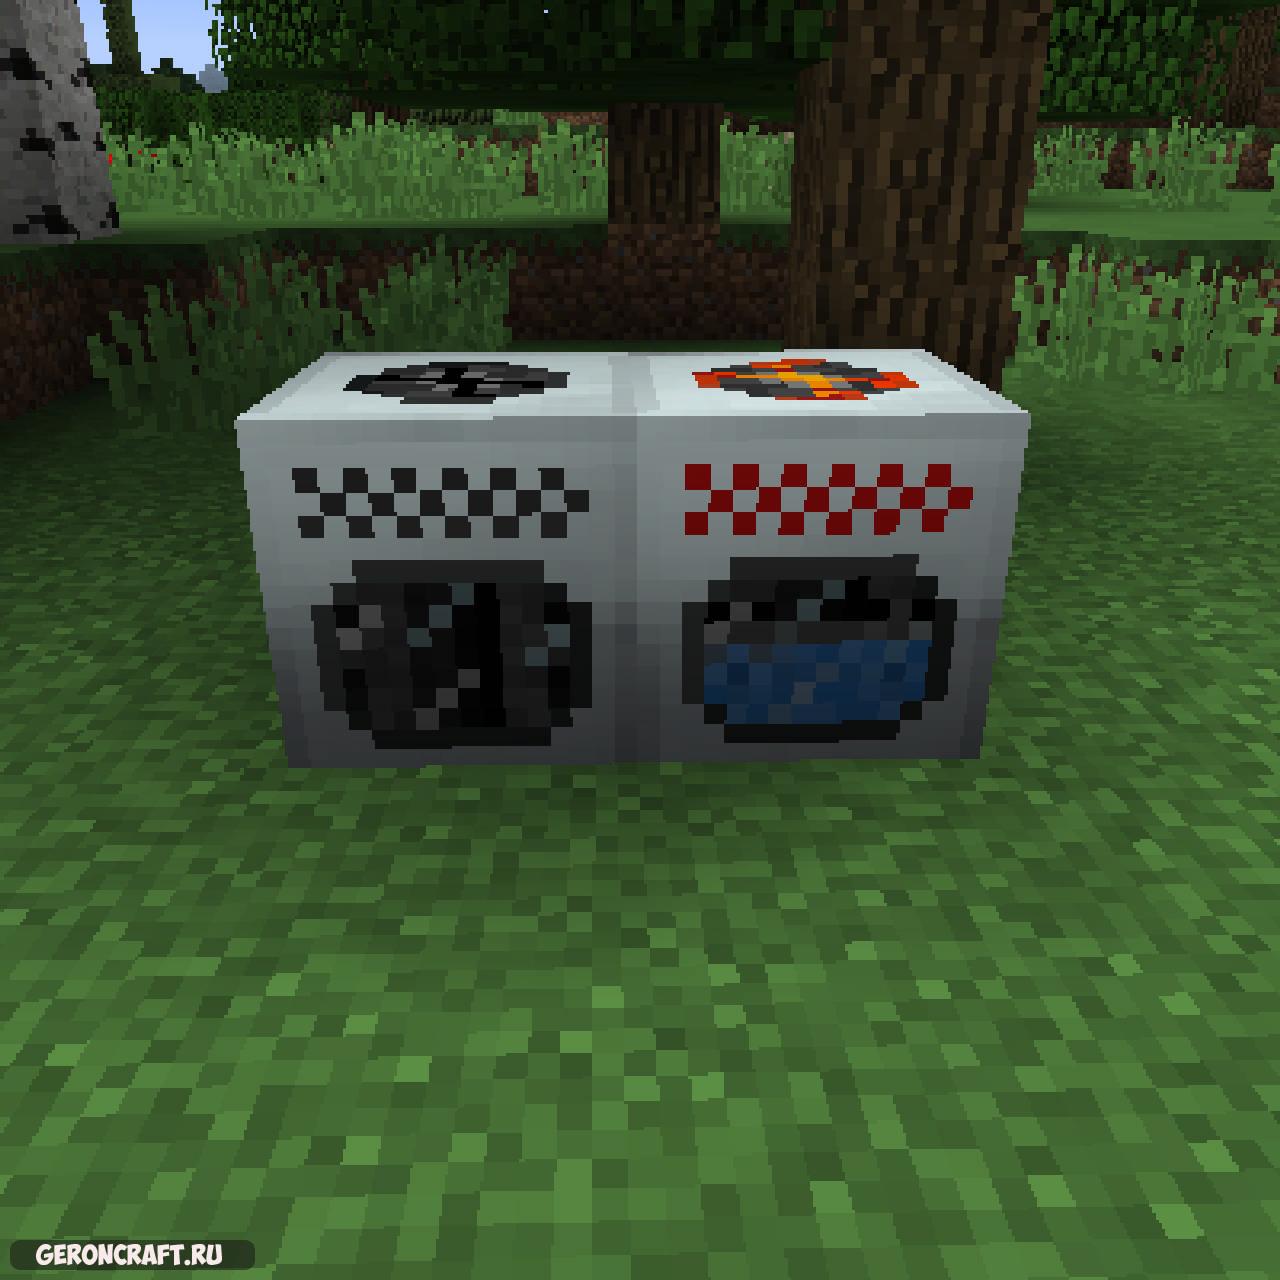 мод для майнкрафт 1.6.4 transformers addon for ic2 #5